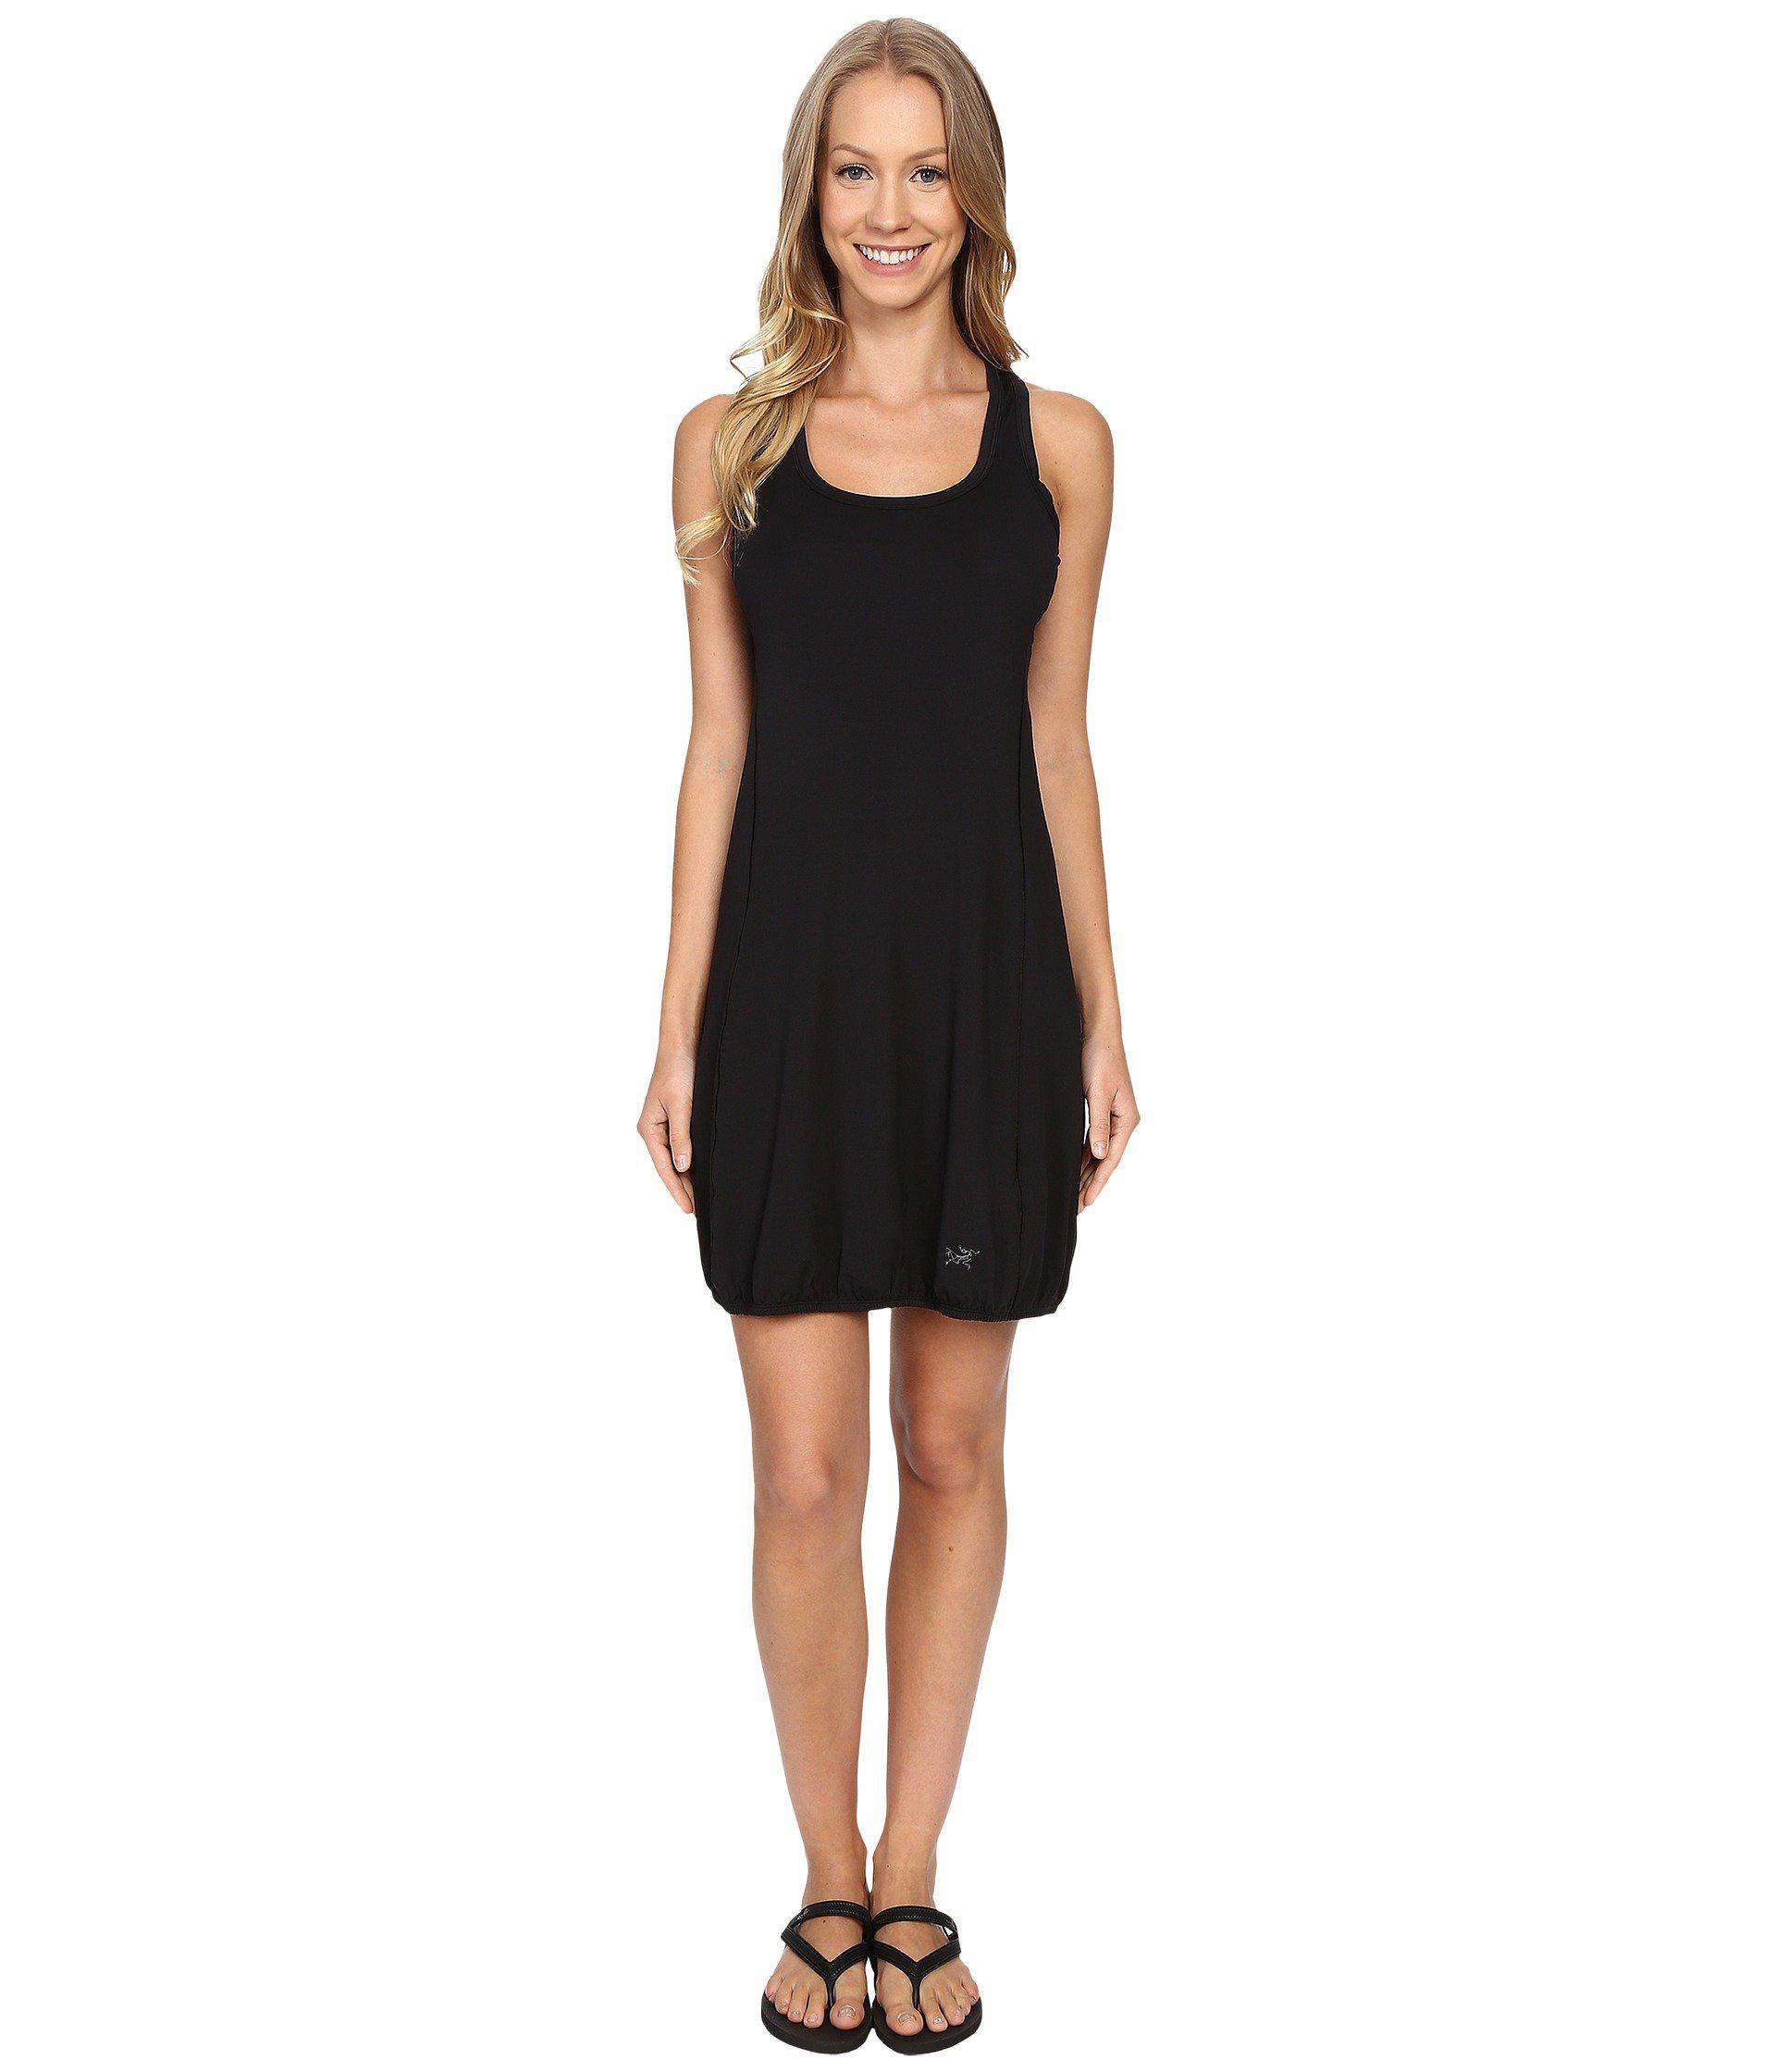 Savona Black Dress Women's Black Women's tBhCxsdQr